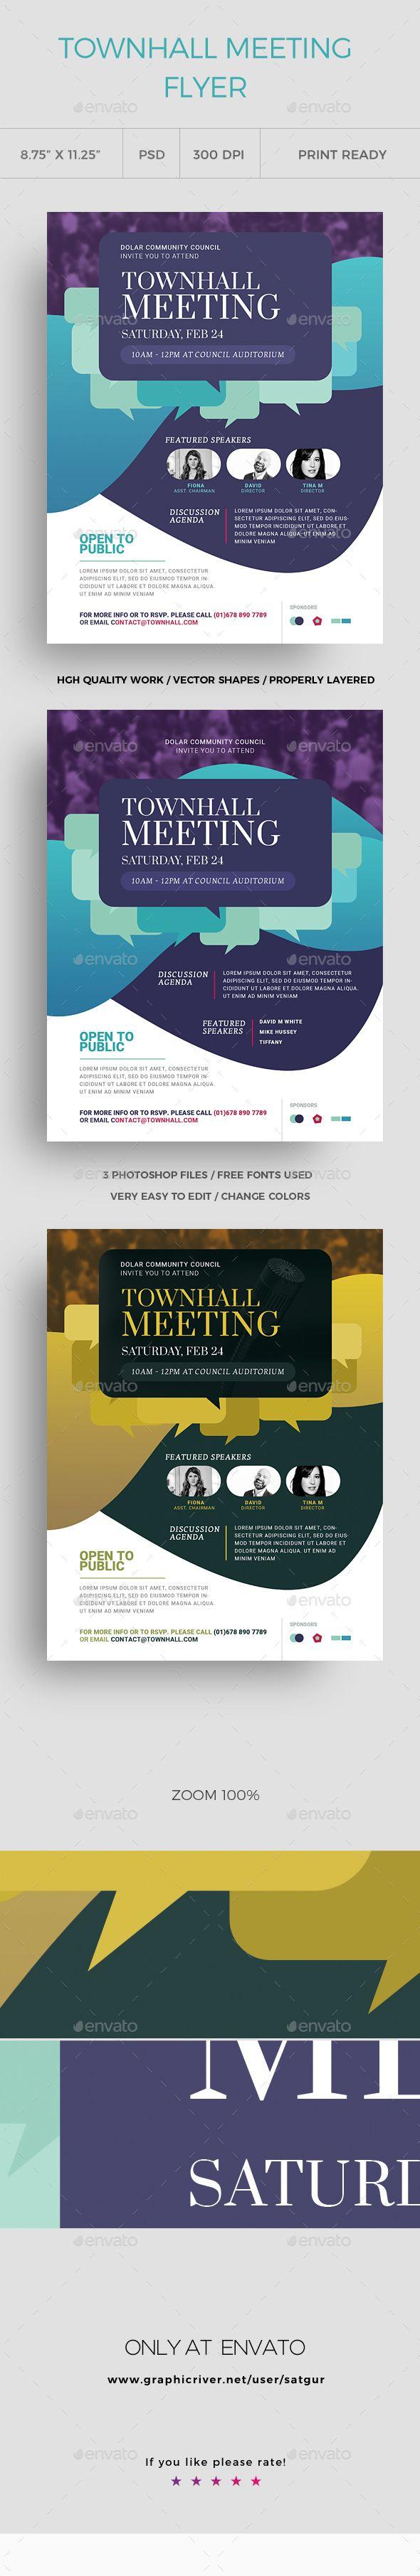 Meeting Flyer Template Seatledavidjoel